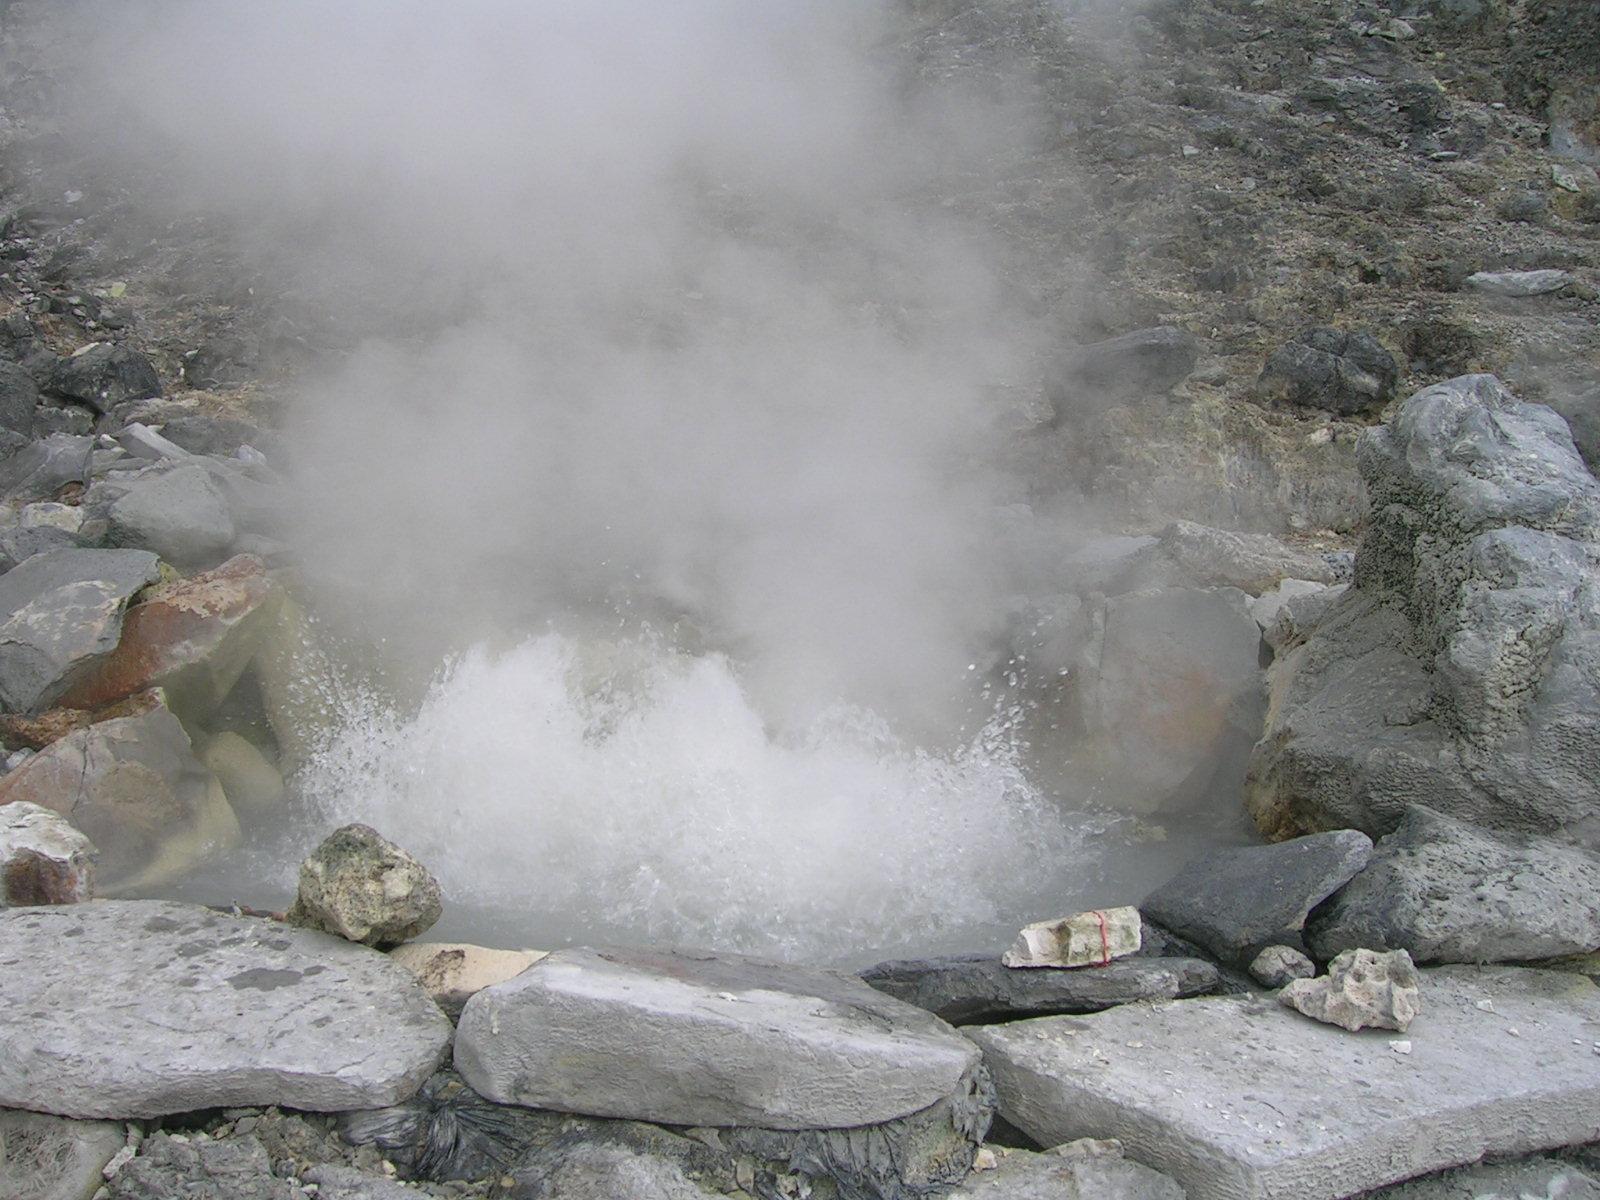 Gambar Gunung Tangkuban Perahu - Ardi La Madi's Blog